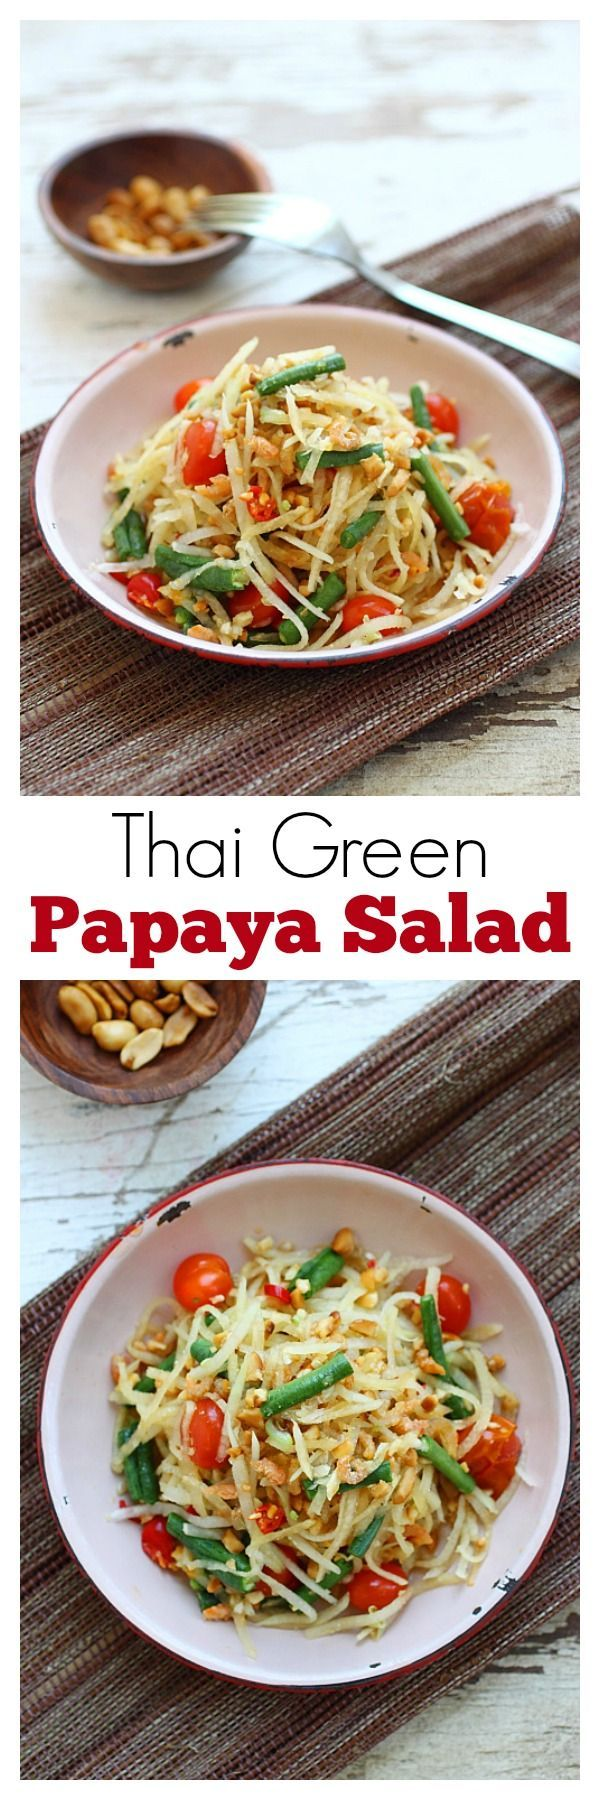 Thai green papaya salad - the best salad ever with shredded green papaya, long beans and tomatoes. So yummy | rasamalaysia.com